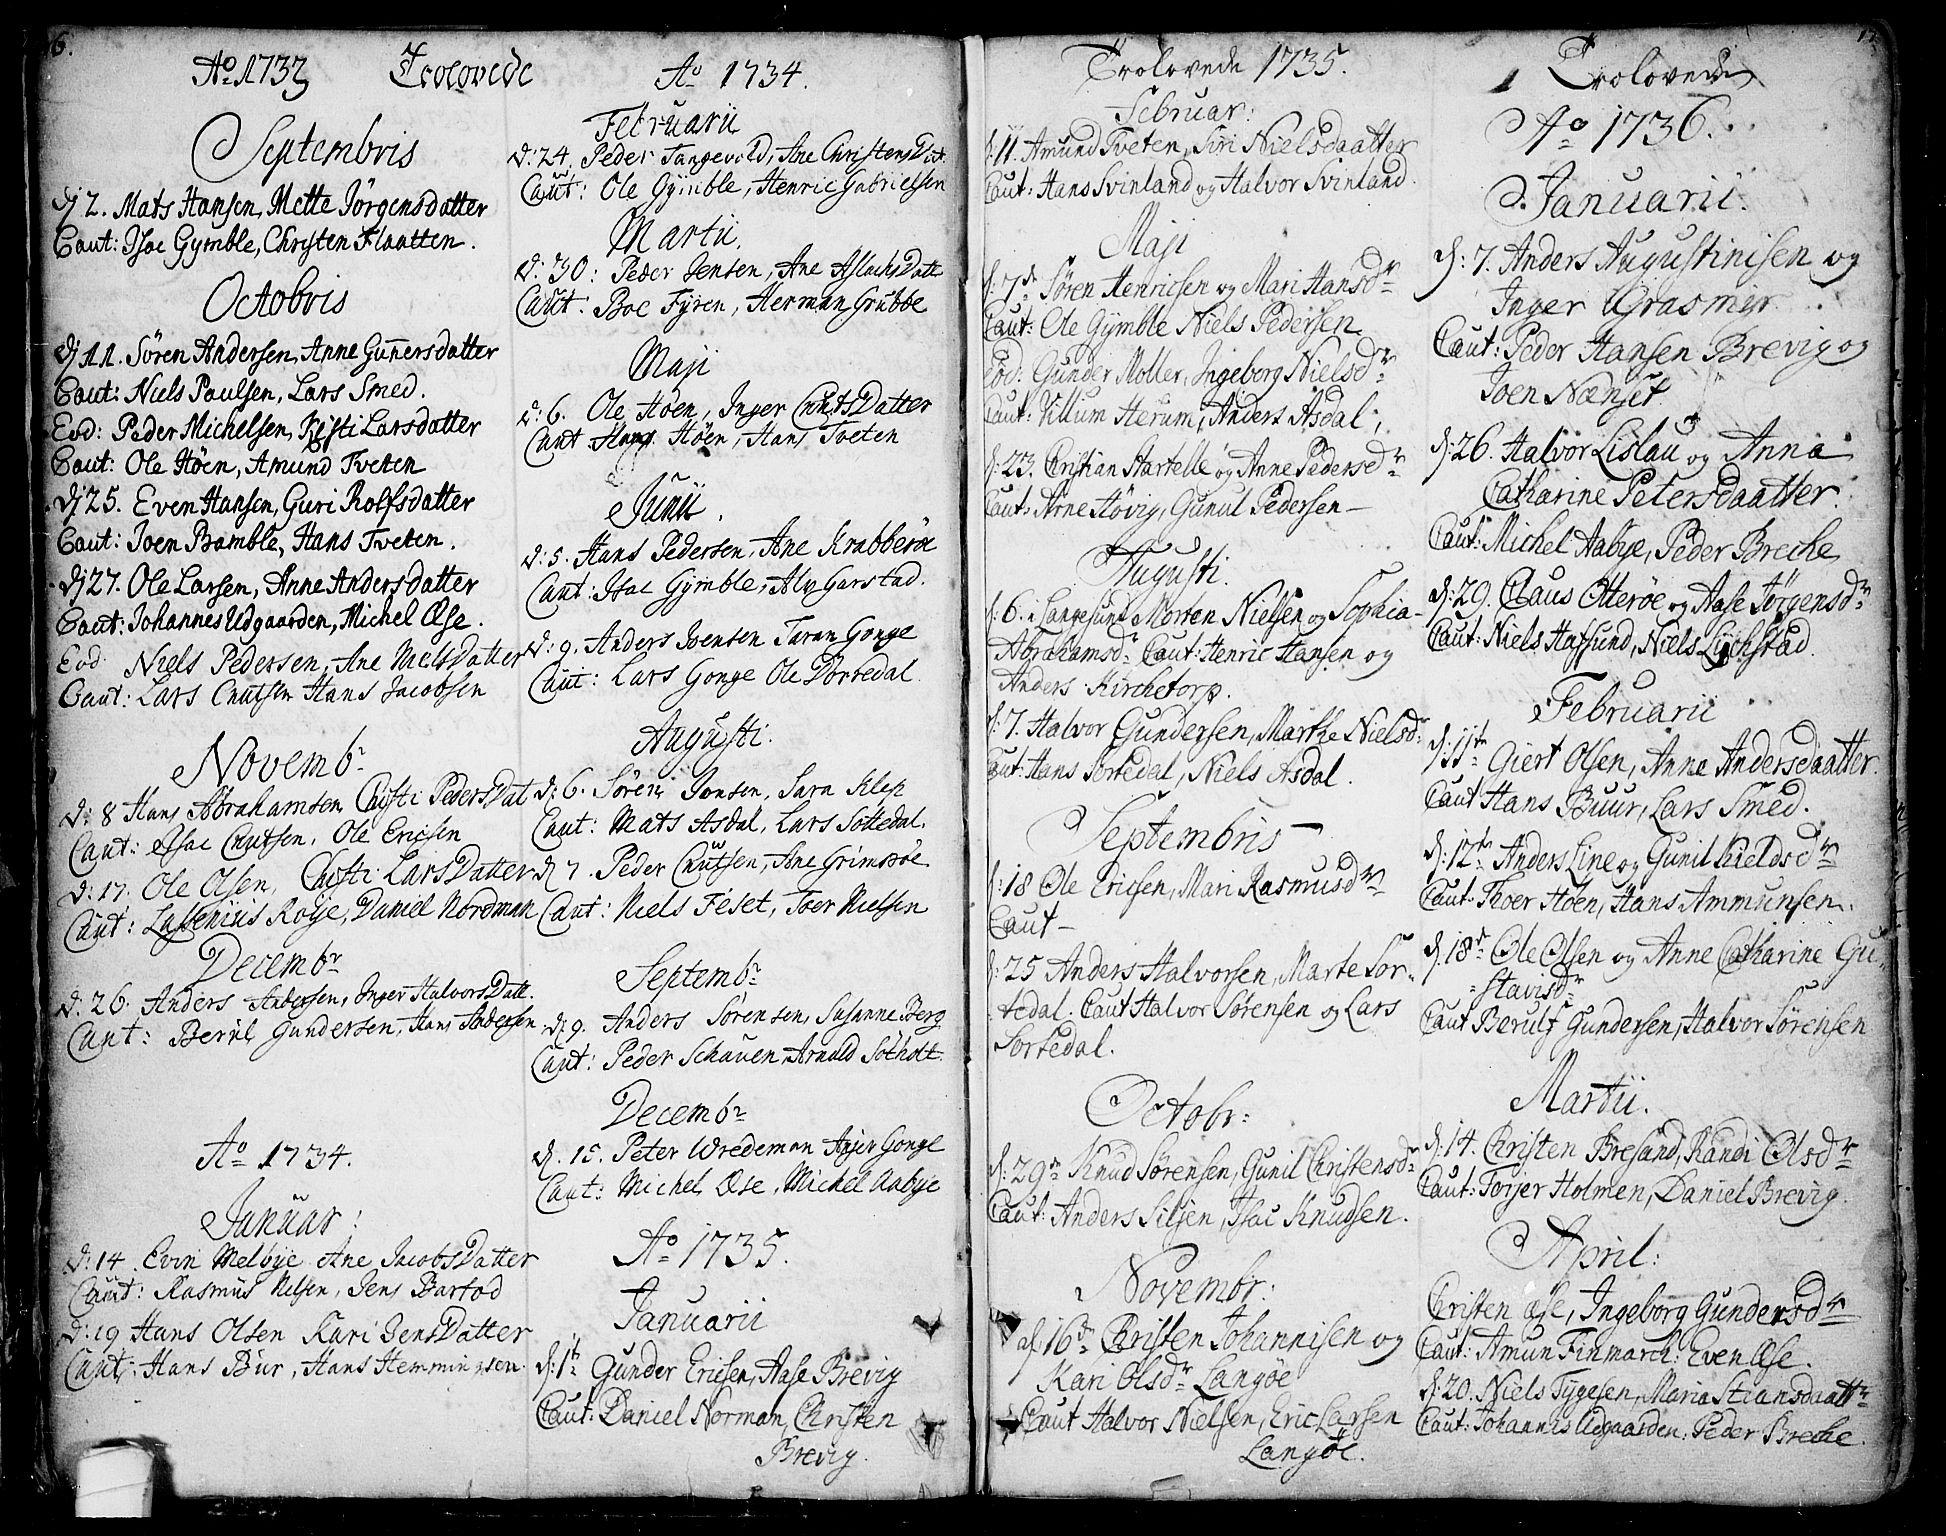 SAKO, Bamble kirkebøker, F/Fa/L0001: Ministerialbok nr. I 1, 1702-1774, s. 16-17